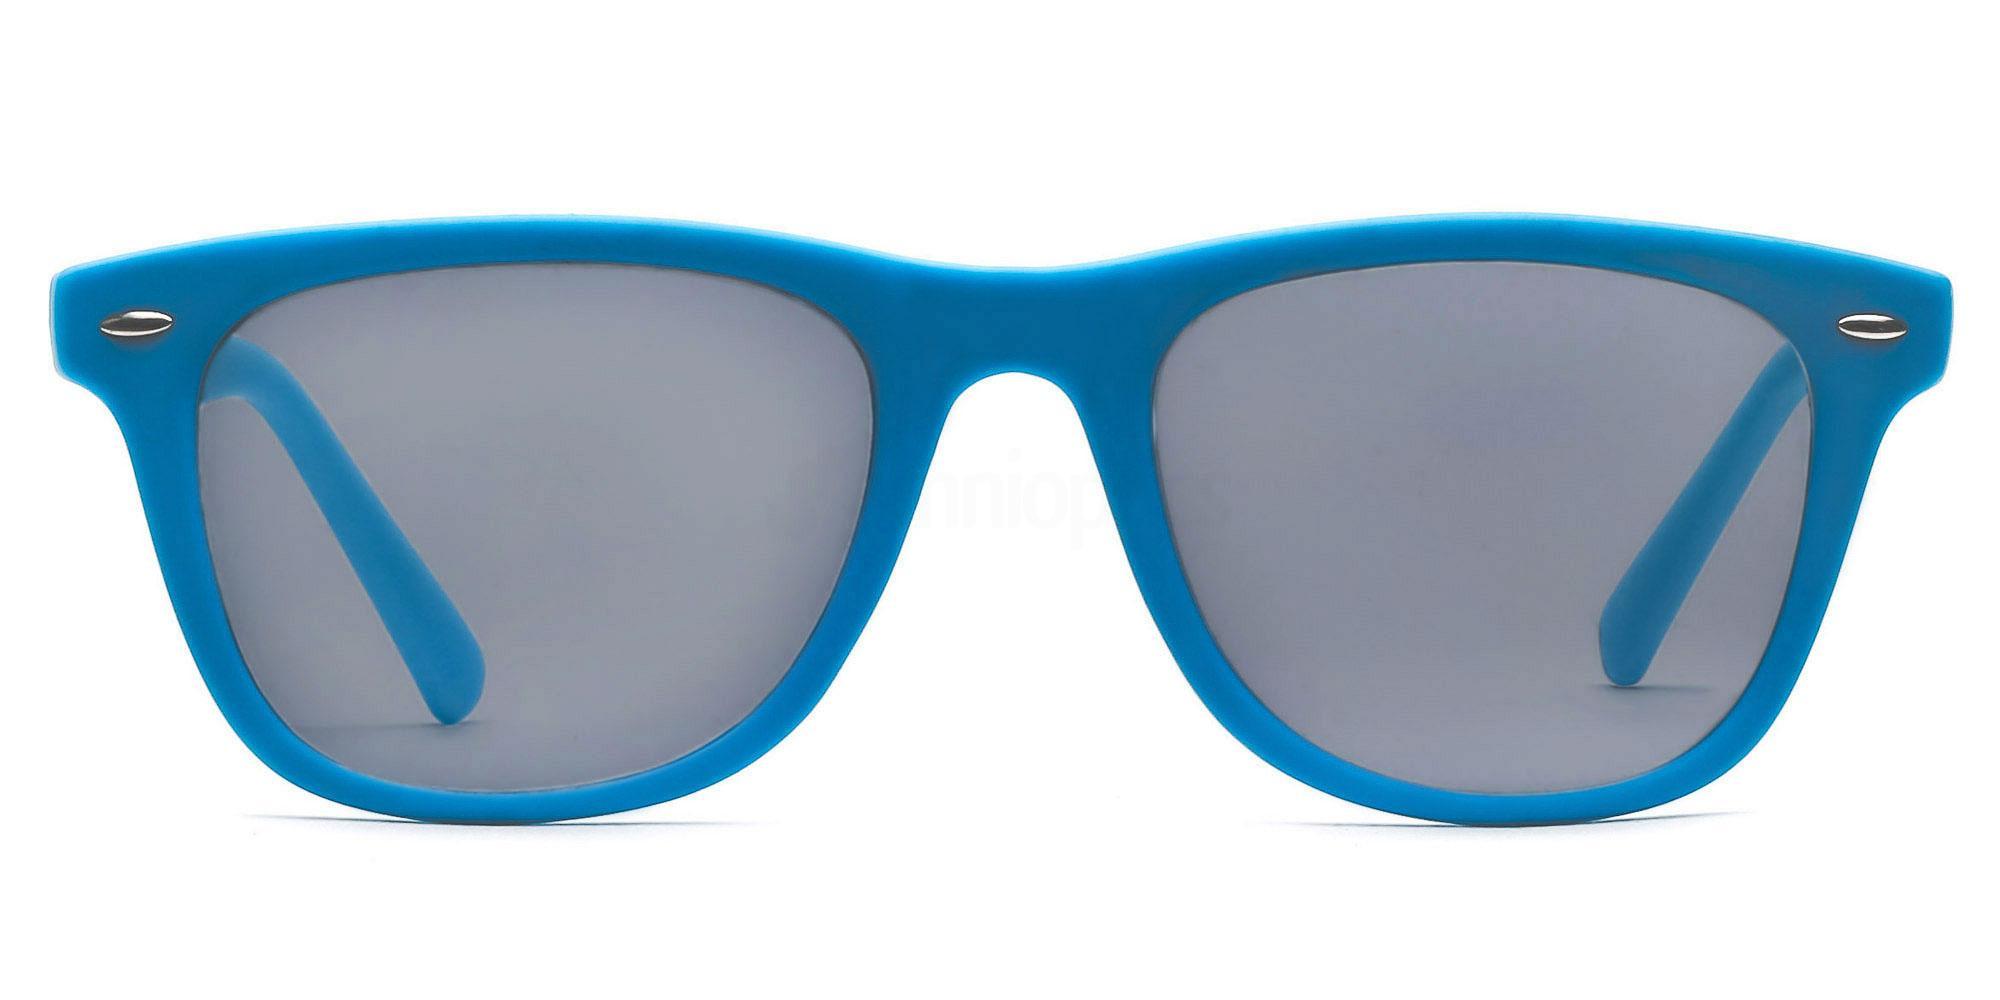 C5 8121 - Light Blue (Sunglasses) , Savannah